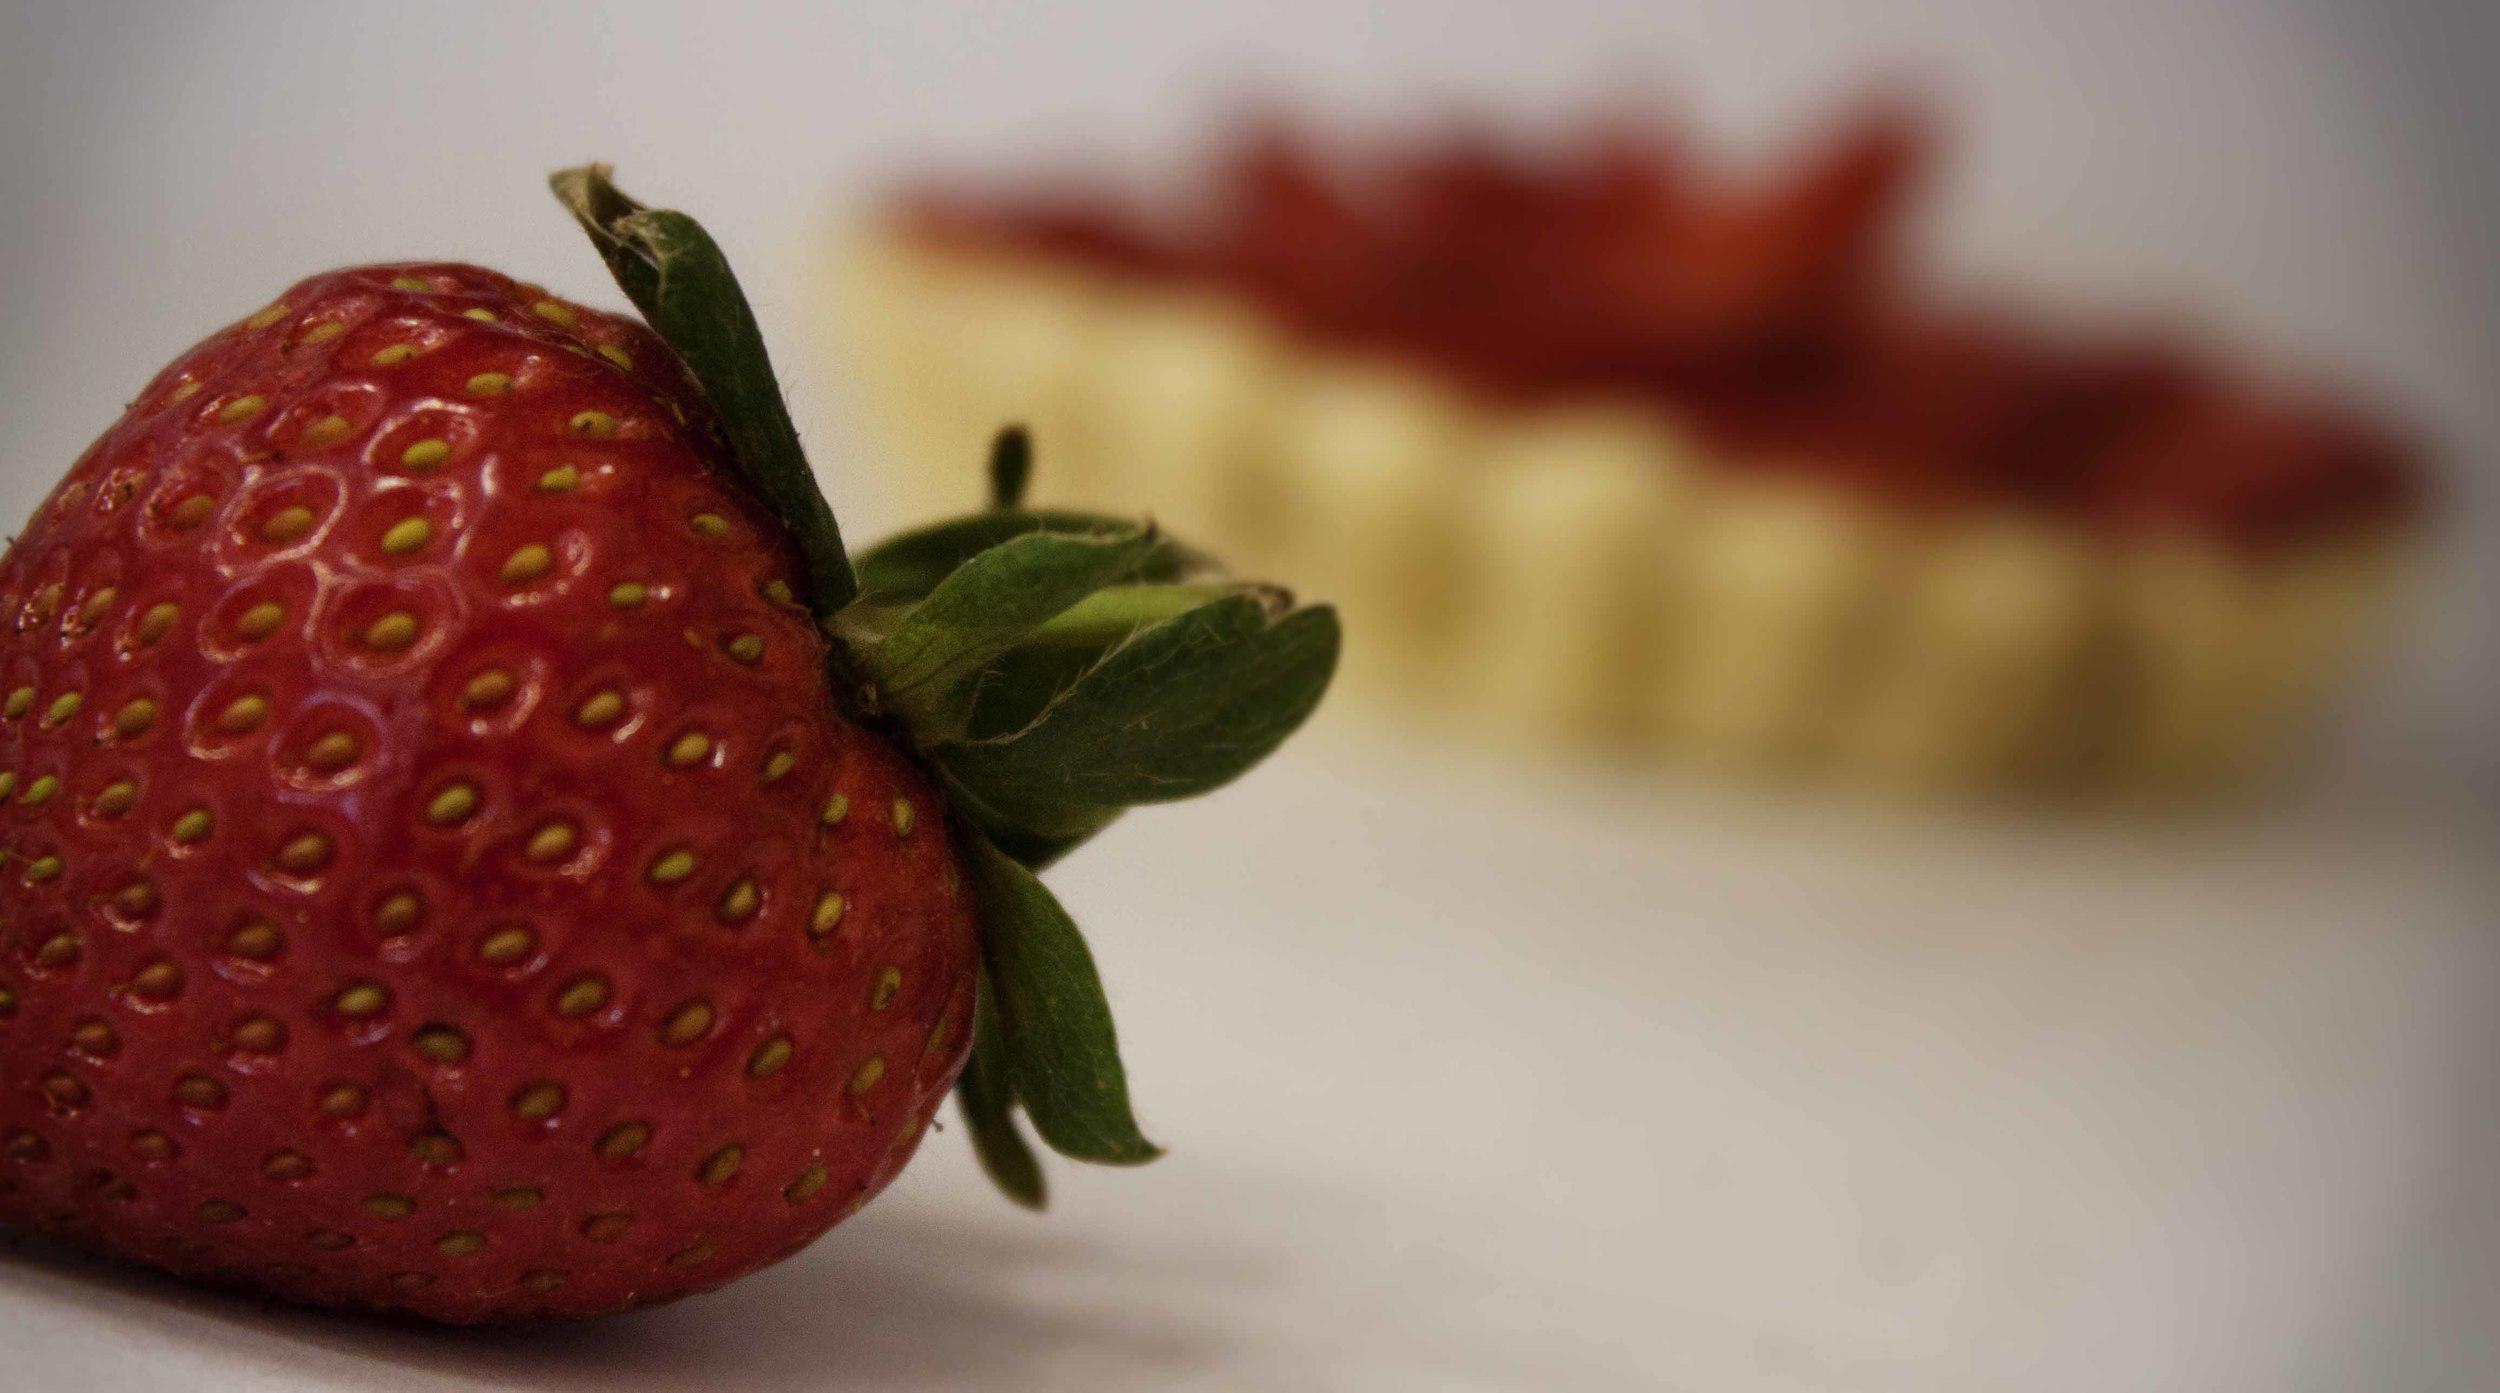 Strawberry sweet crust 8.jpg